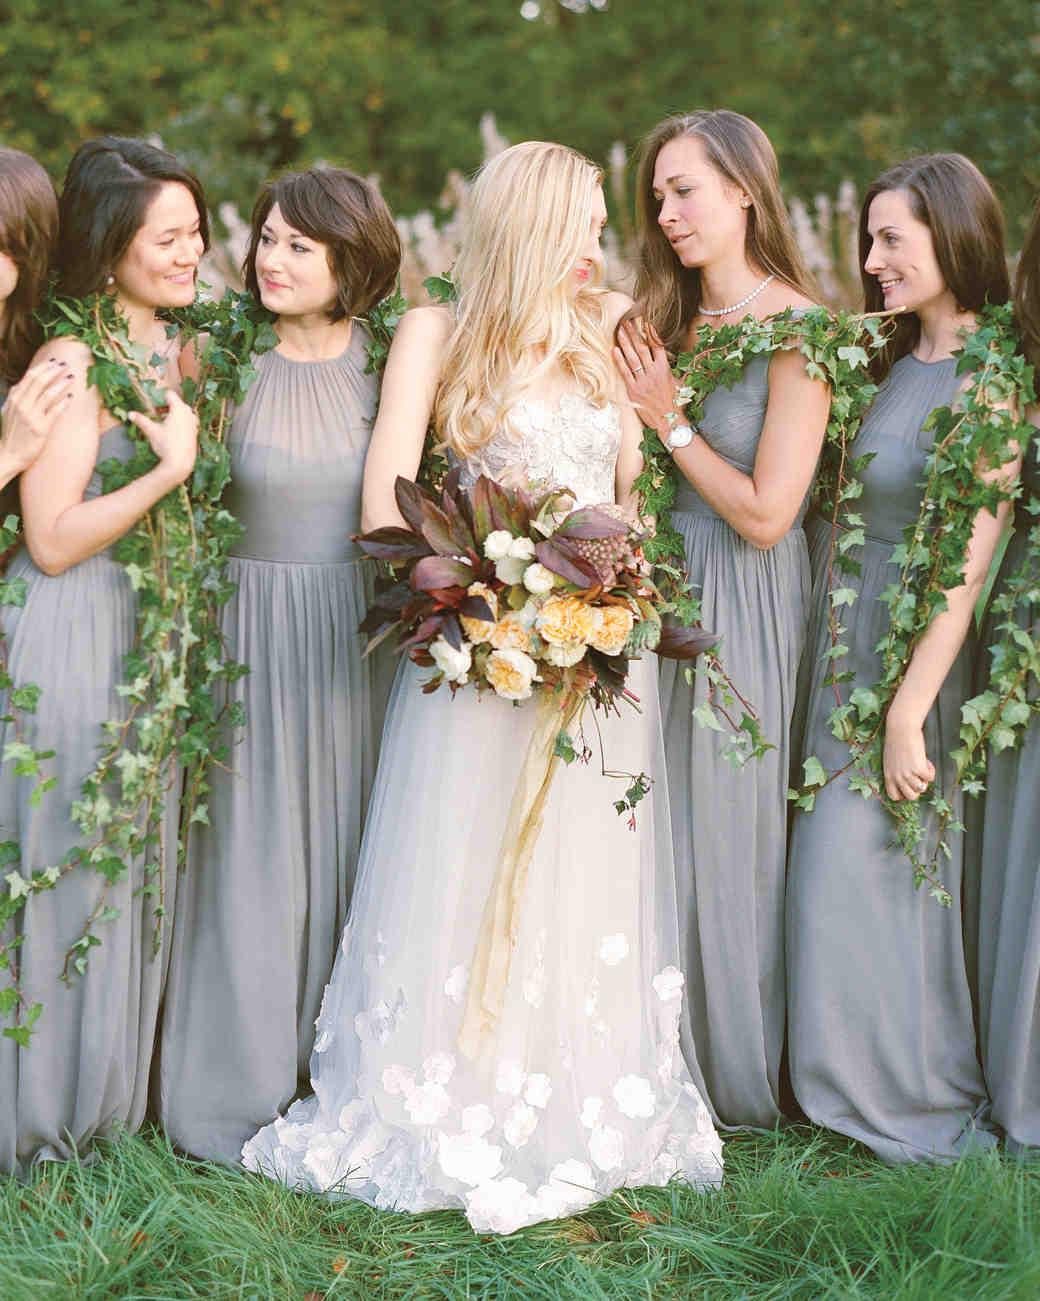 jo-andrew-wedding-ireland-1528-s112147.jpg